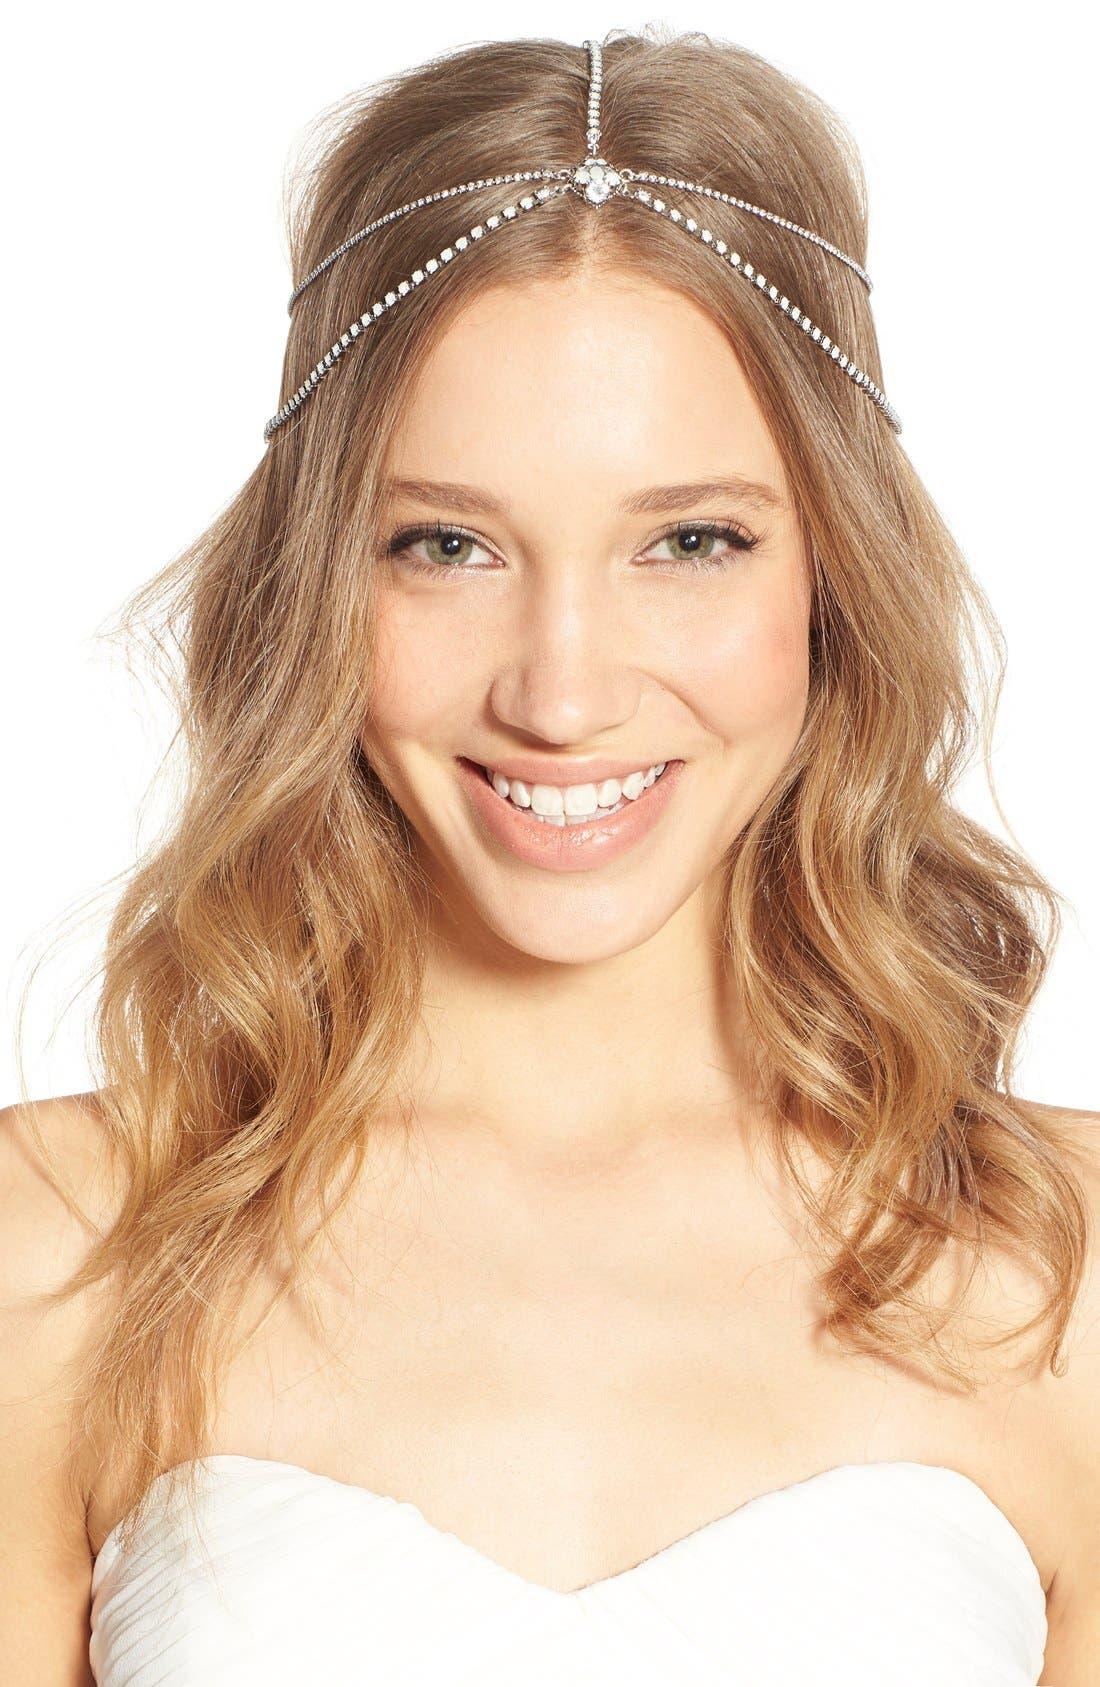 'Lindsay' Embellished Hair Chain,                             Main thumbnail 1, color,